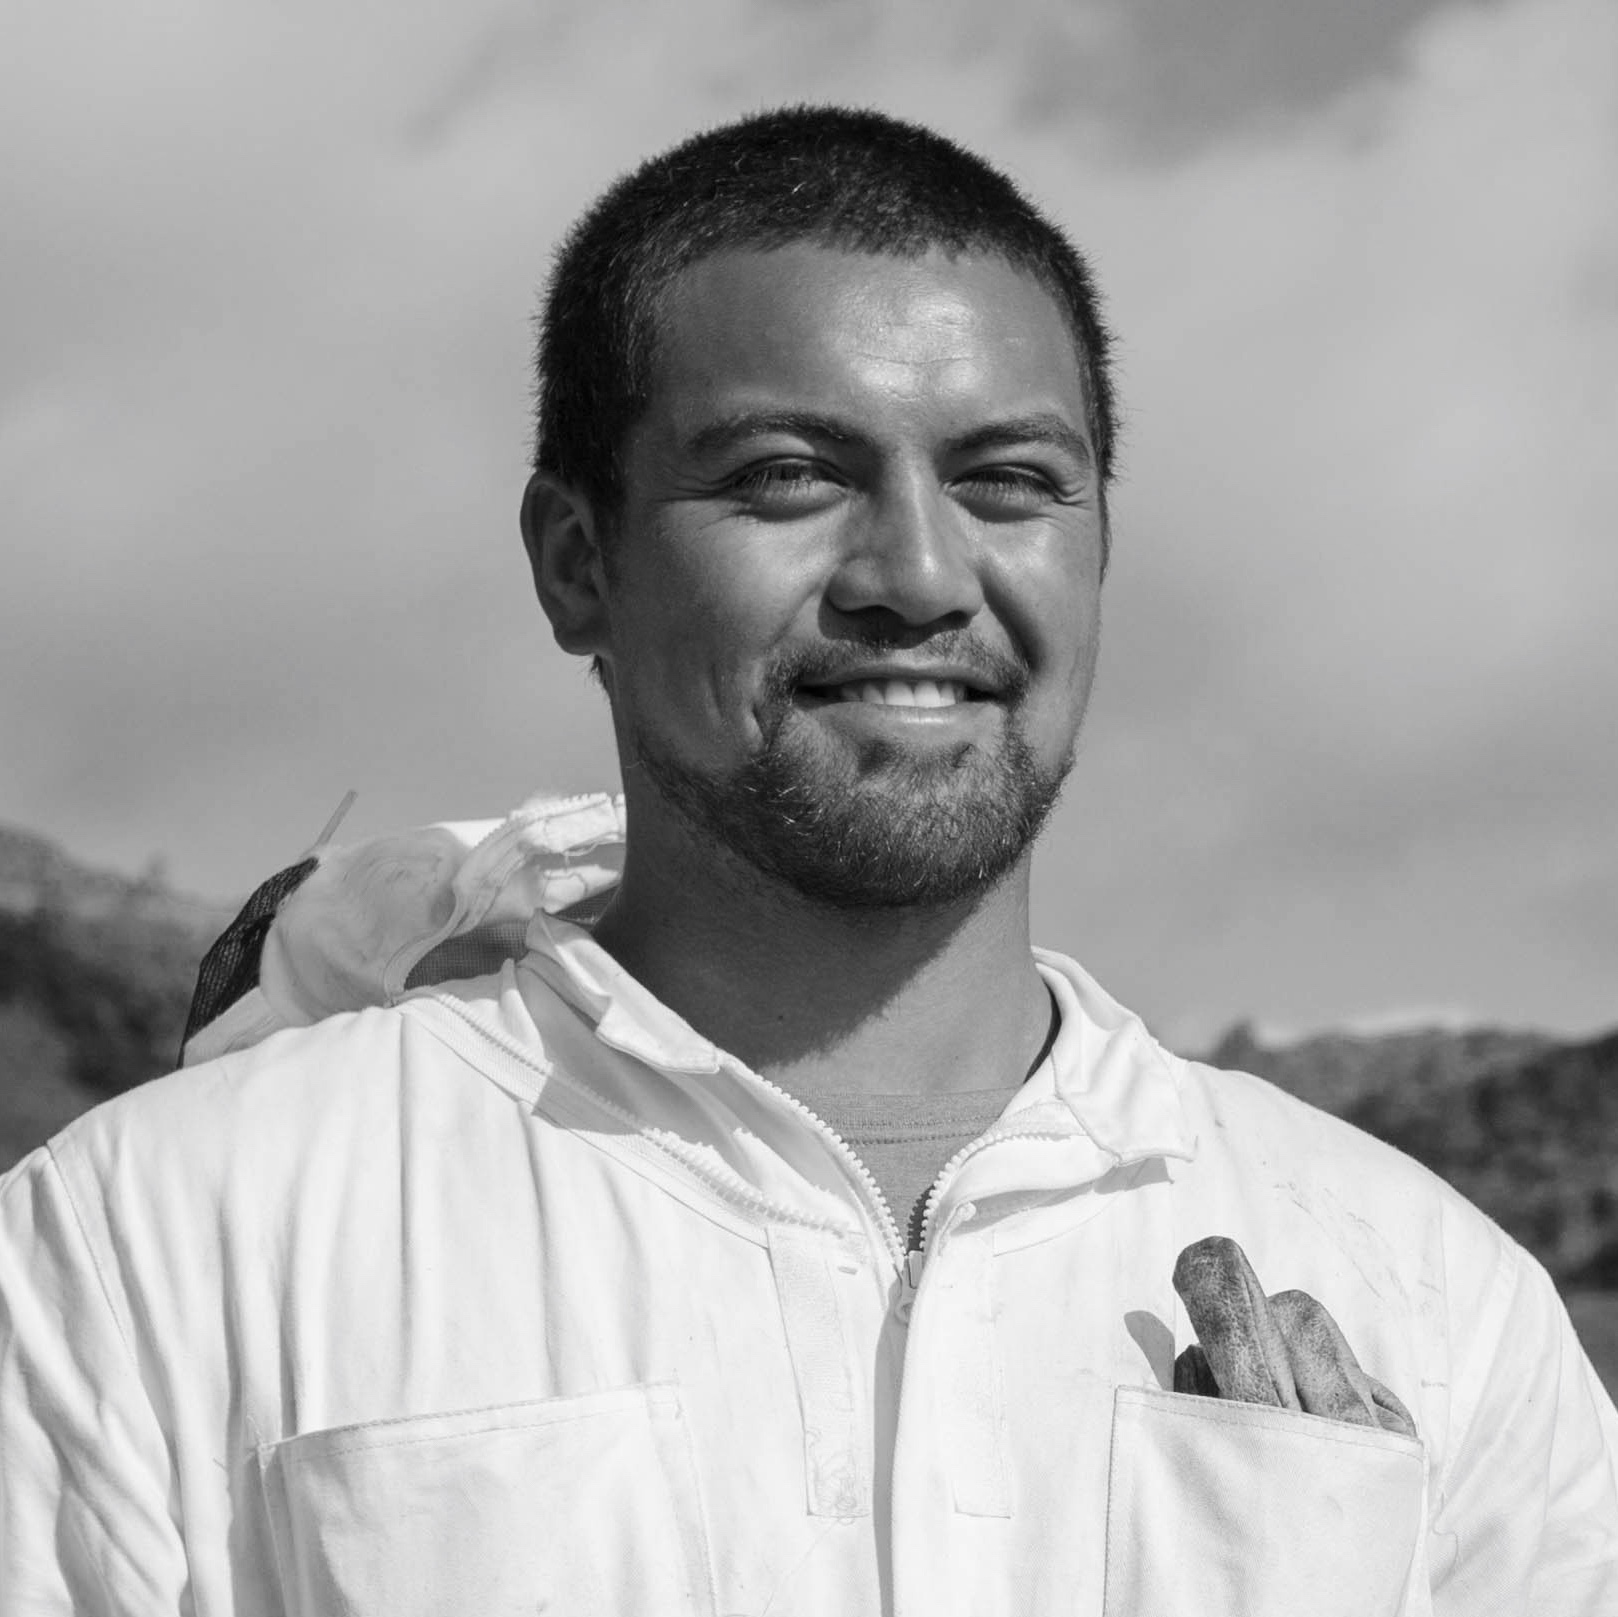 MIKAERE MURRAY  - Beekeeper and Team Leader